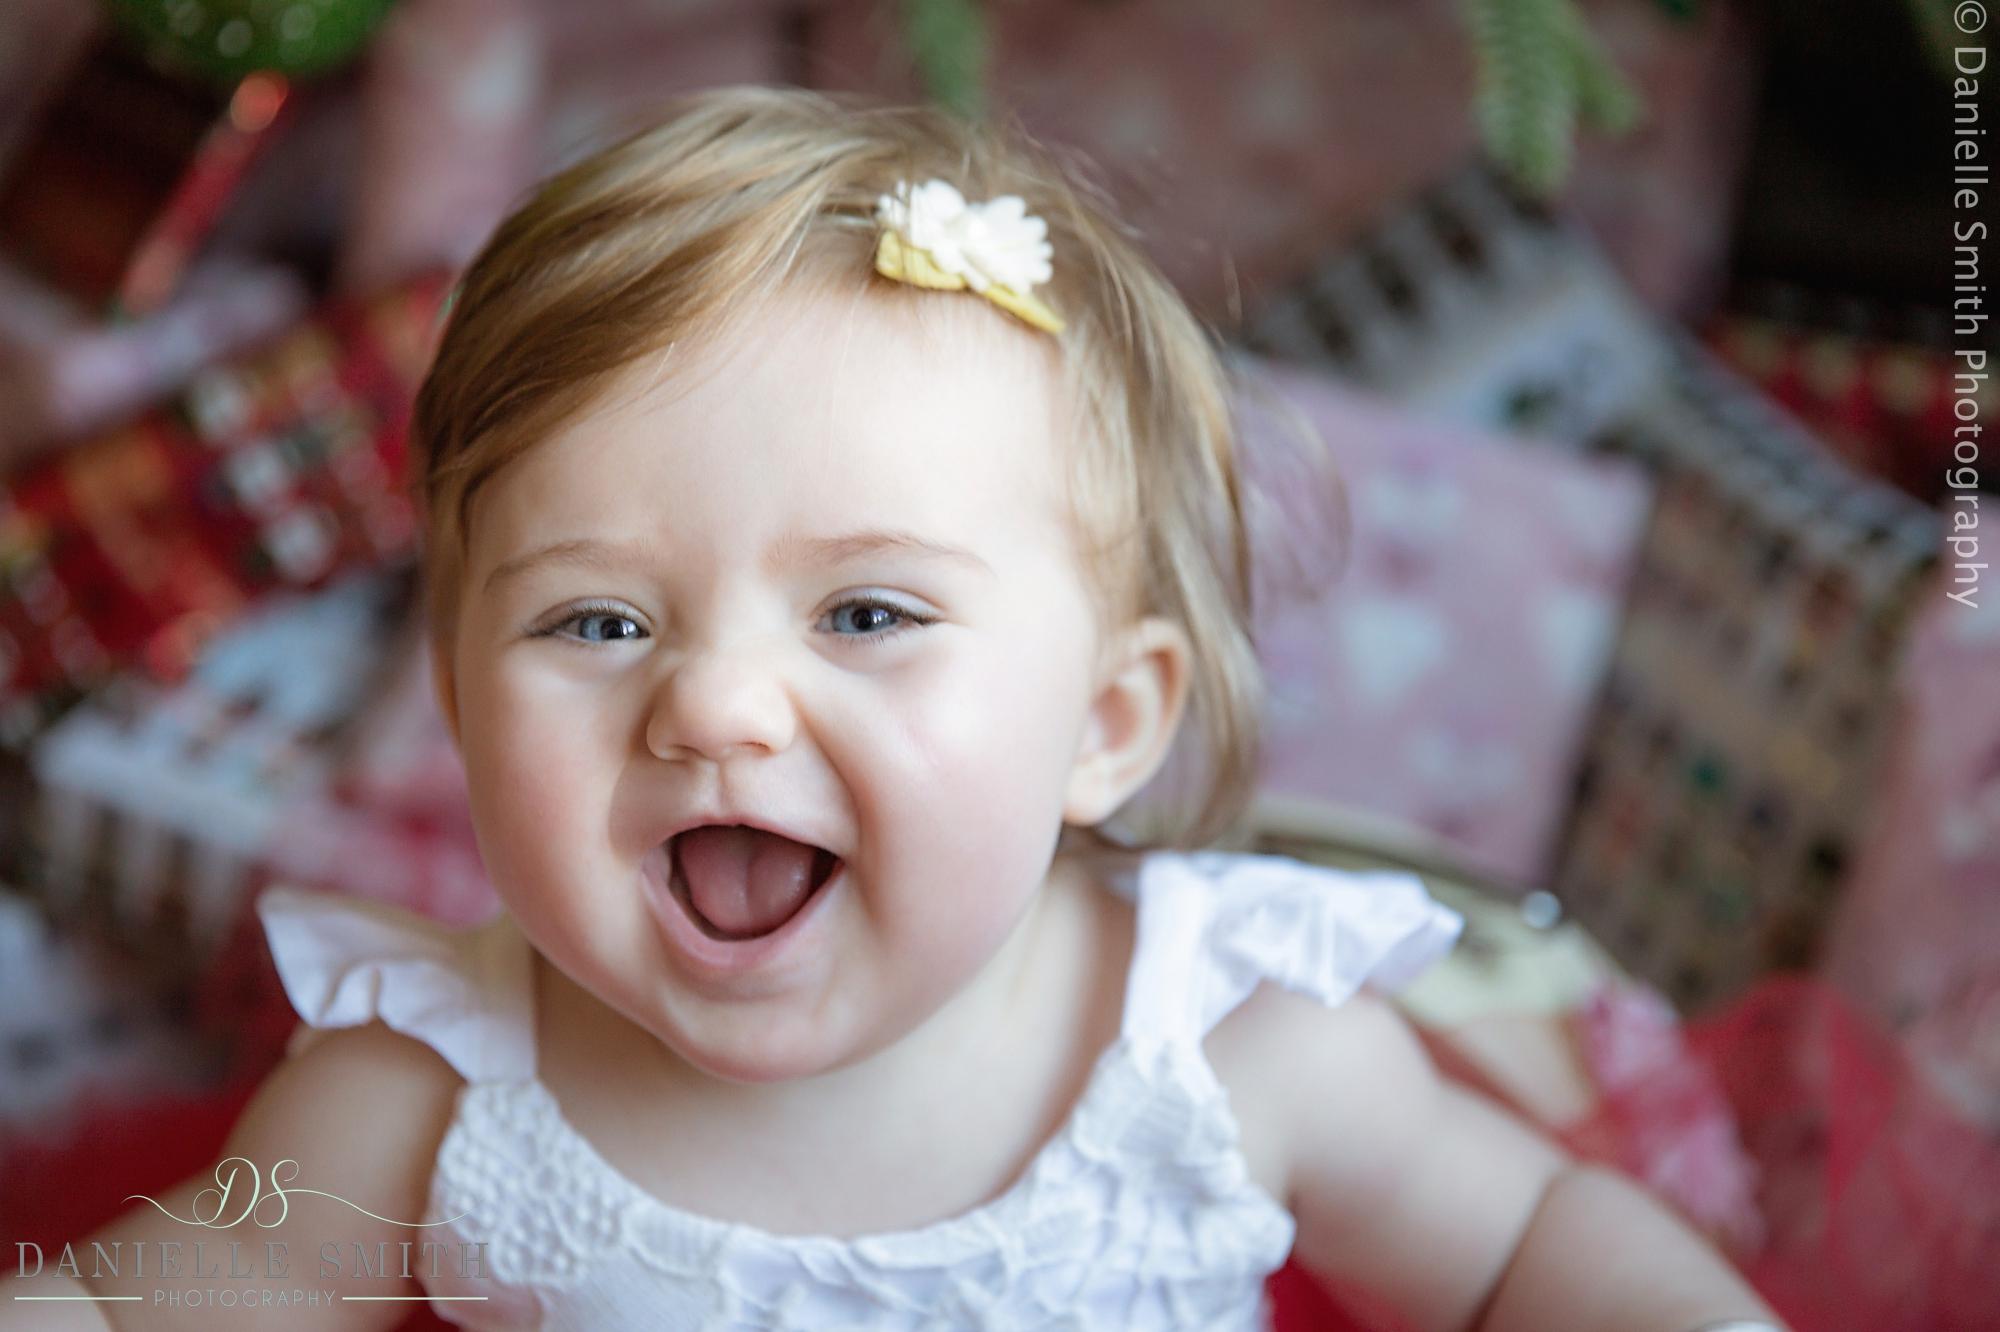 baby girl with huge smile at christmas